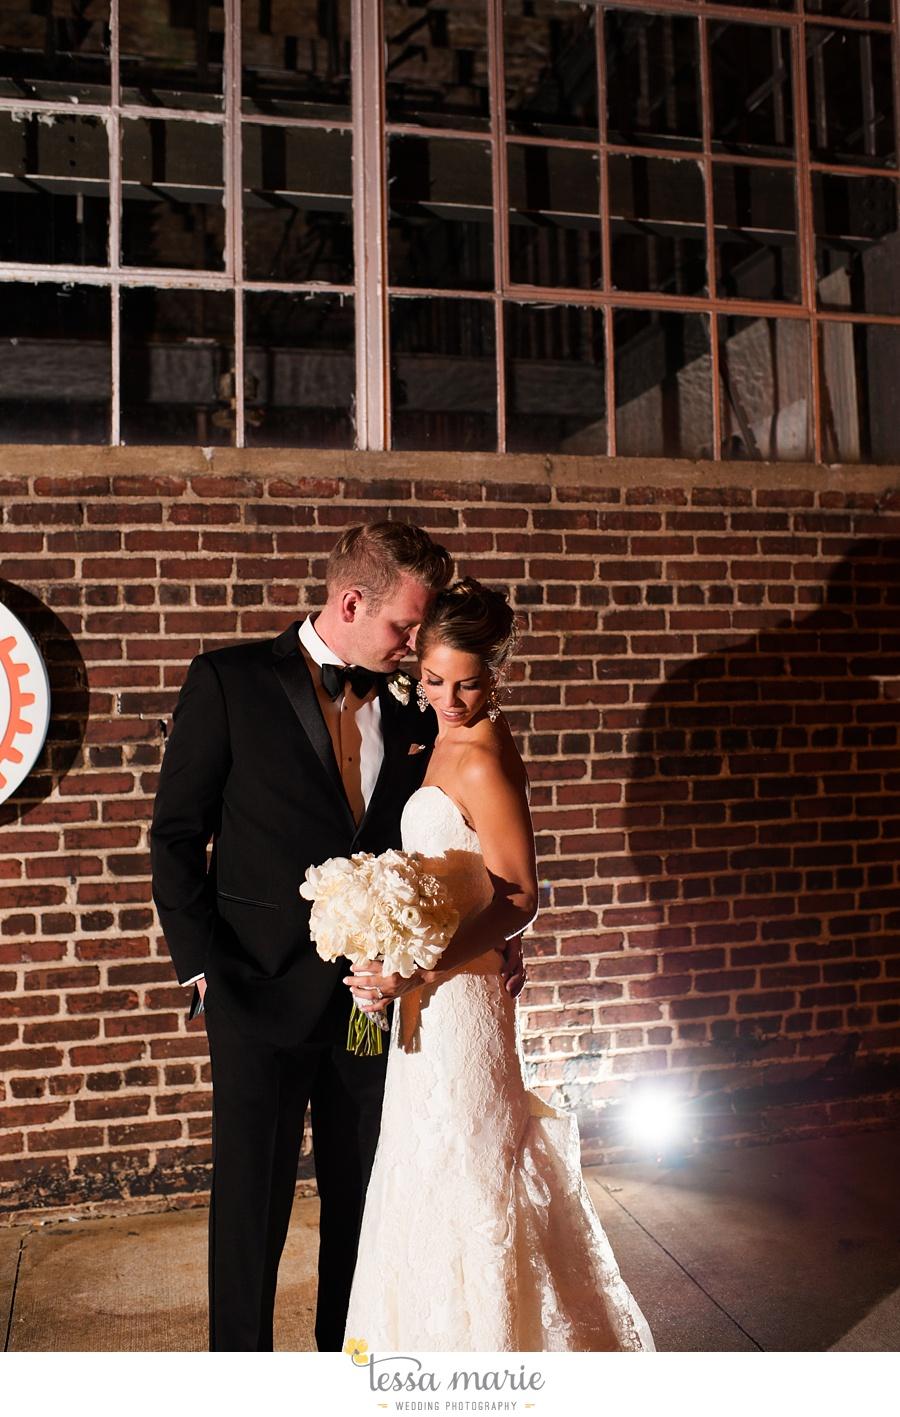 343_tessa_marie_weddings_emotional_moments_photography_king_low_wedding_sam_neil_best_atlanta_wedding_photographer